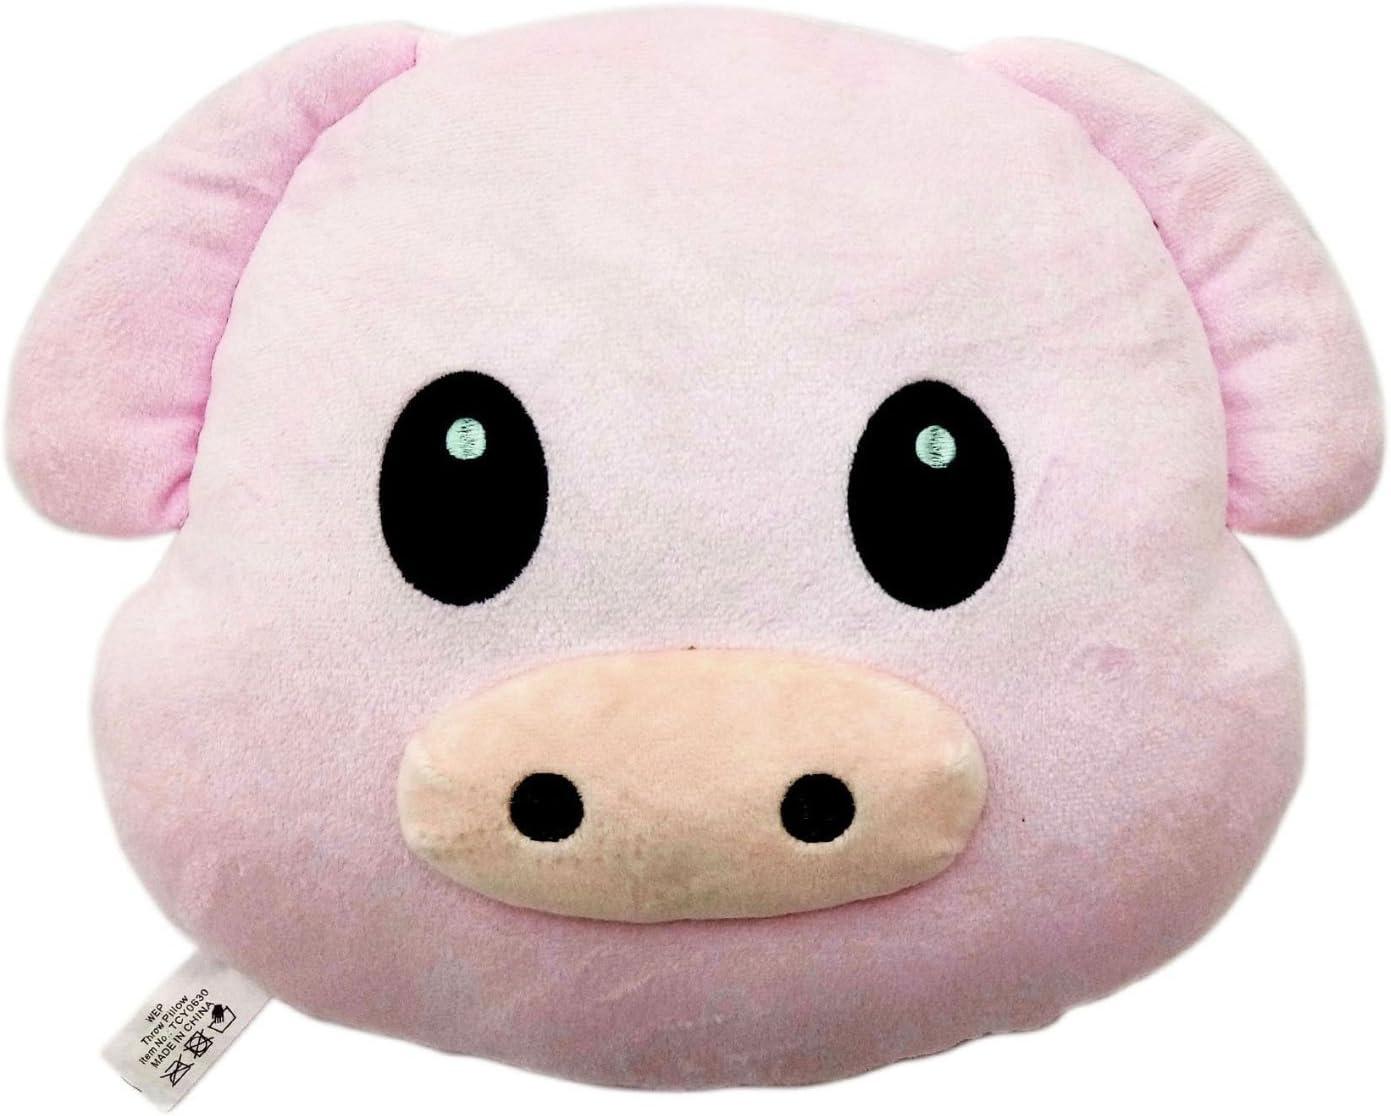 Pink Poop Emoji Pillow Emoticon Princess Cushion Soft Plush Toy Doll